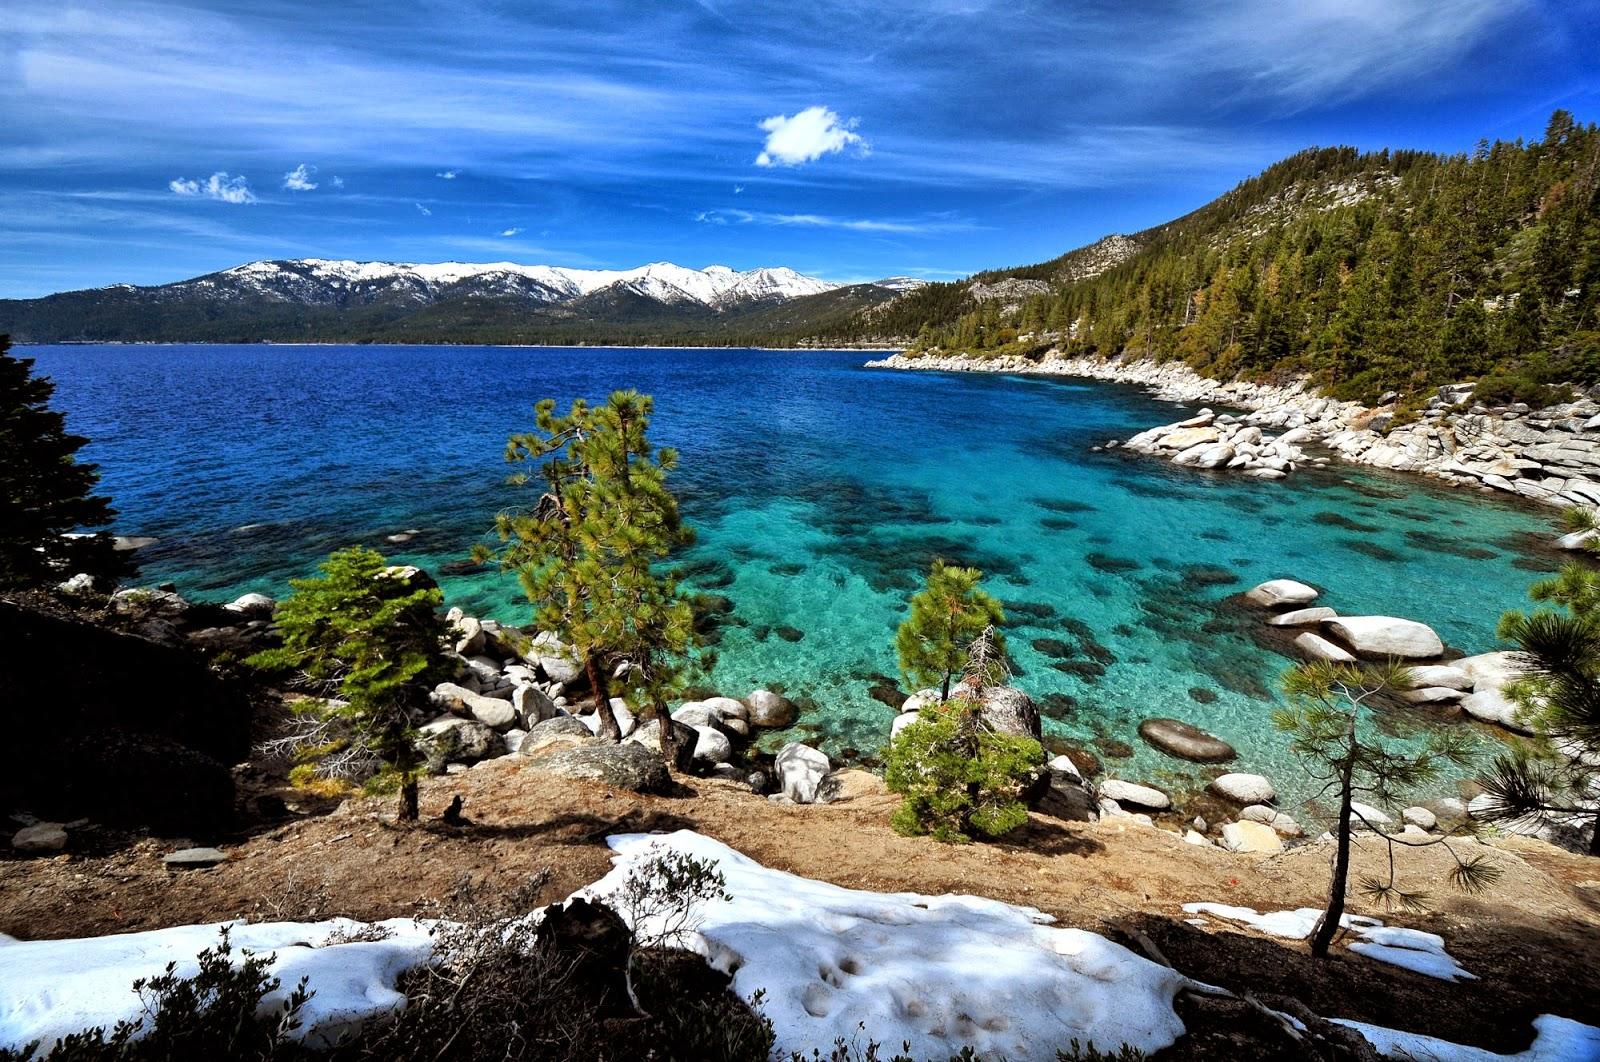 Lake Tahoe California Nevada HD Wallpapers   Top HD Wallpapers 1600x1062